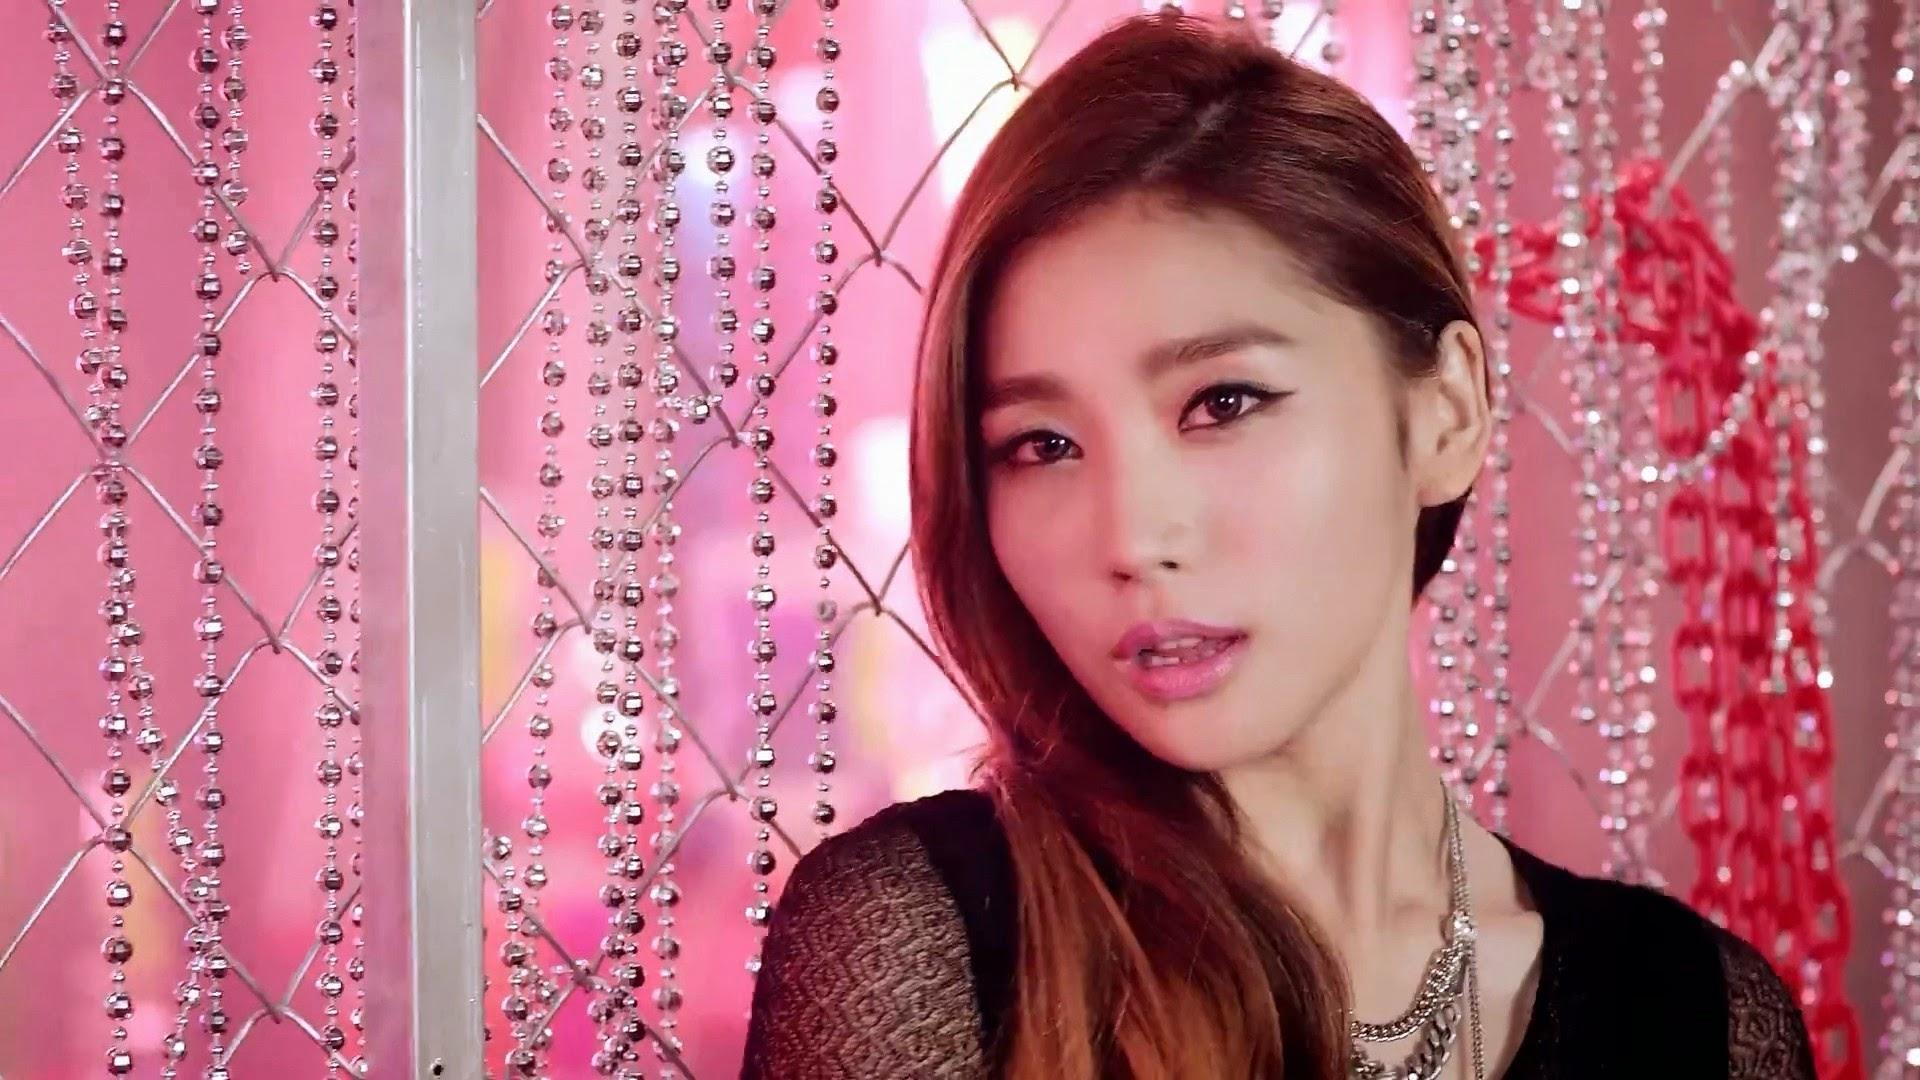 HelloVenus StickySticky Yooyoung